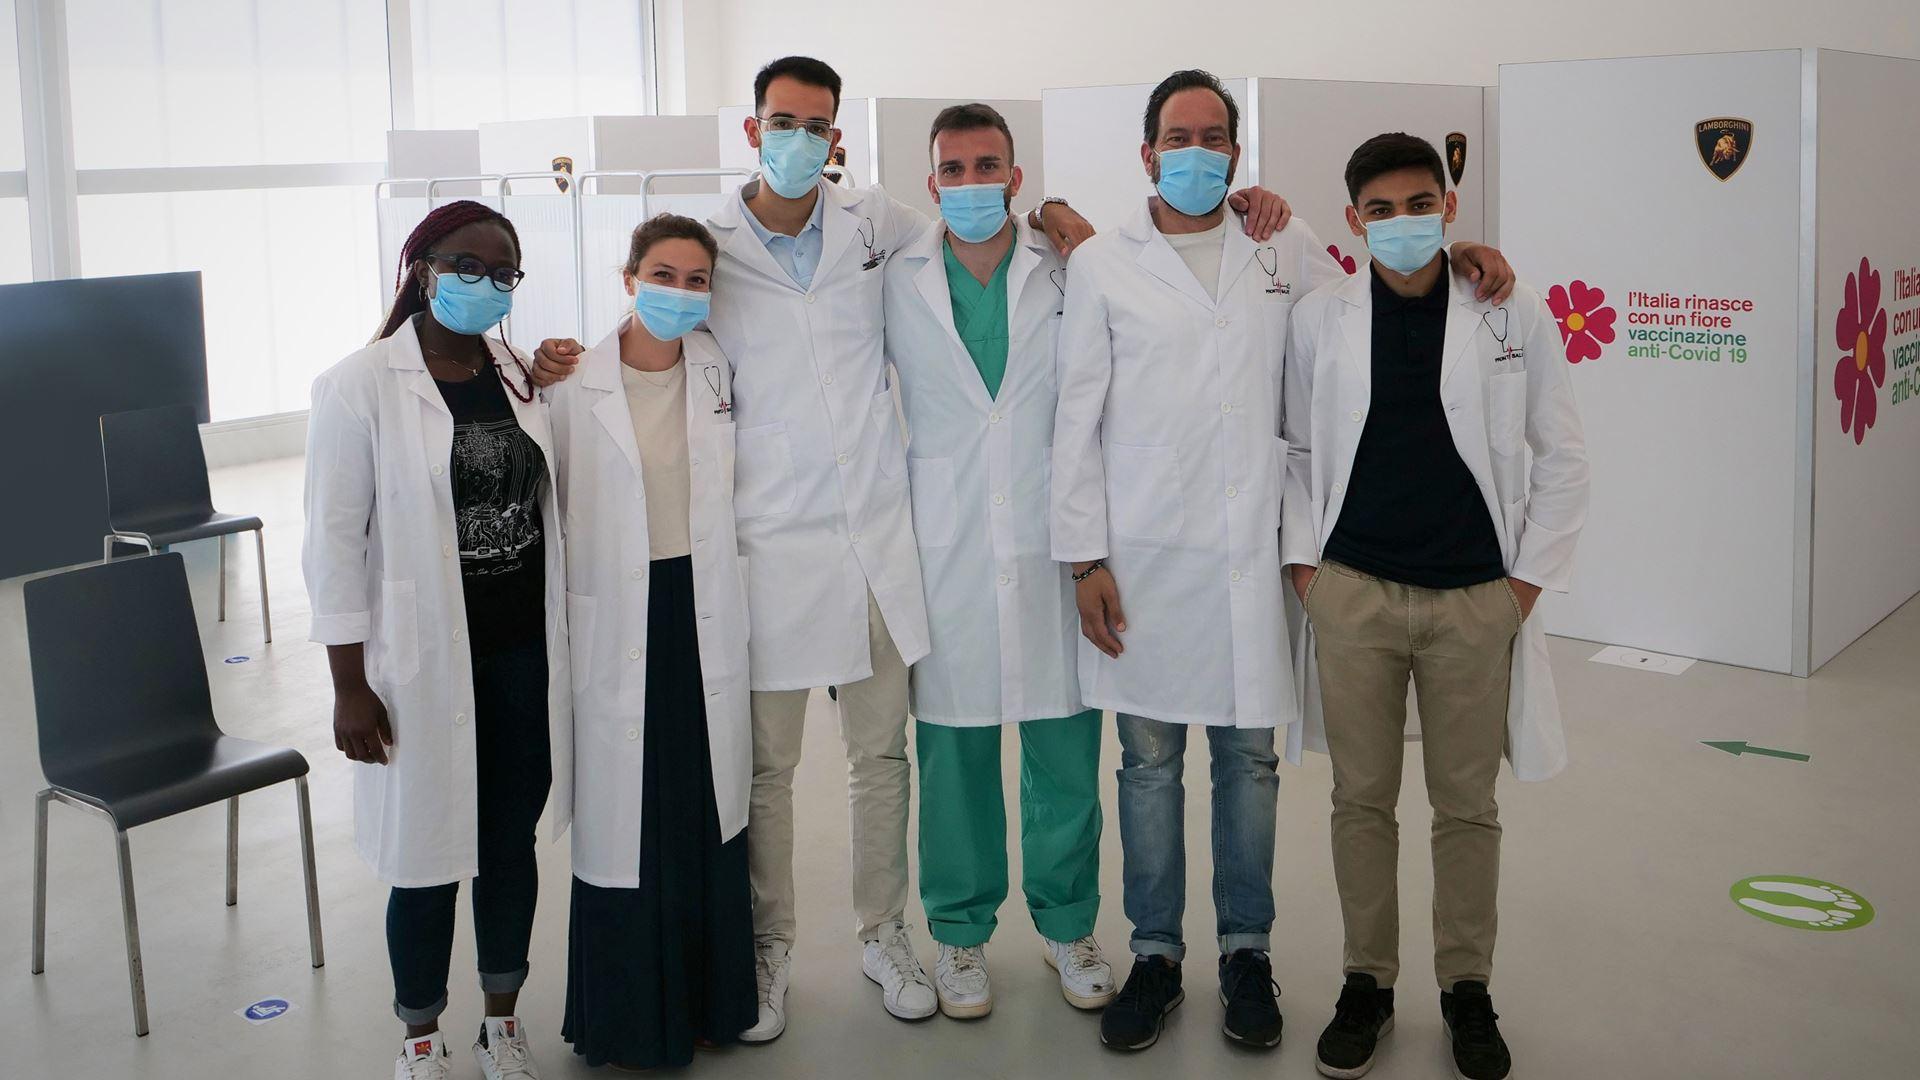 Automobili Lamborghini opens the company vaccination centre - All employees vaccinated in three day - Image 2